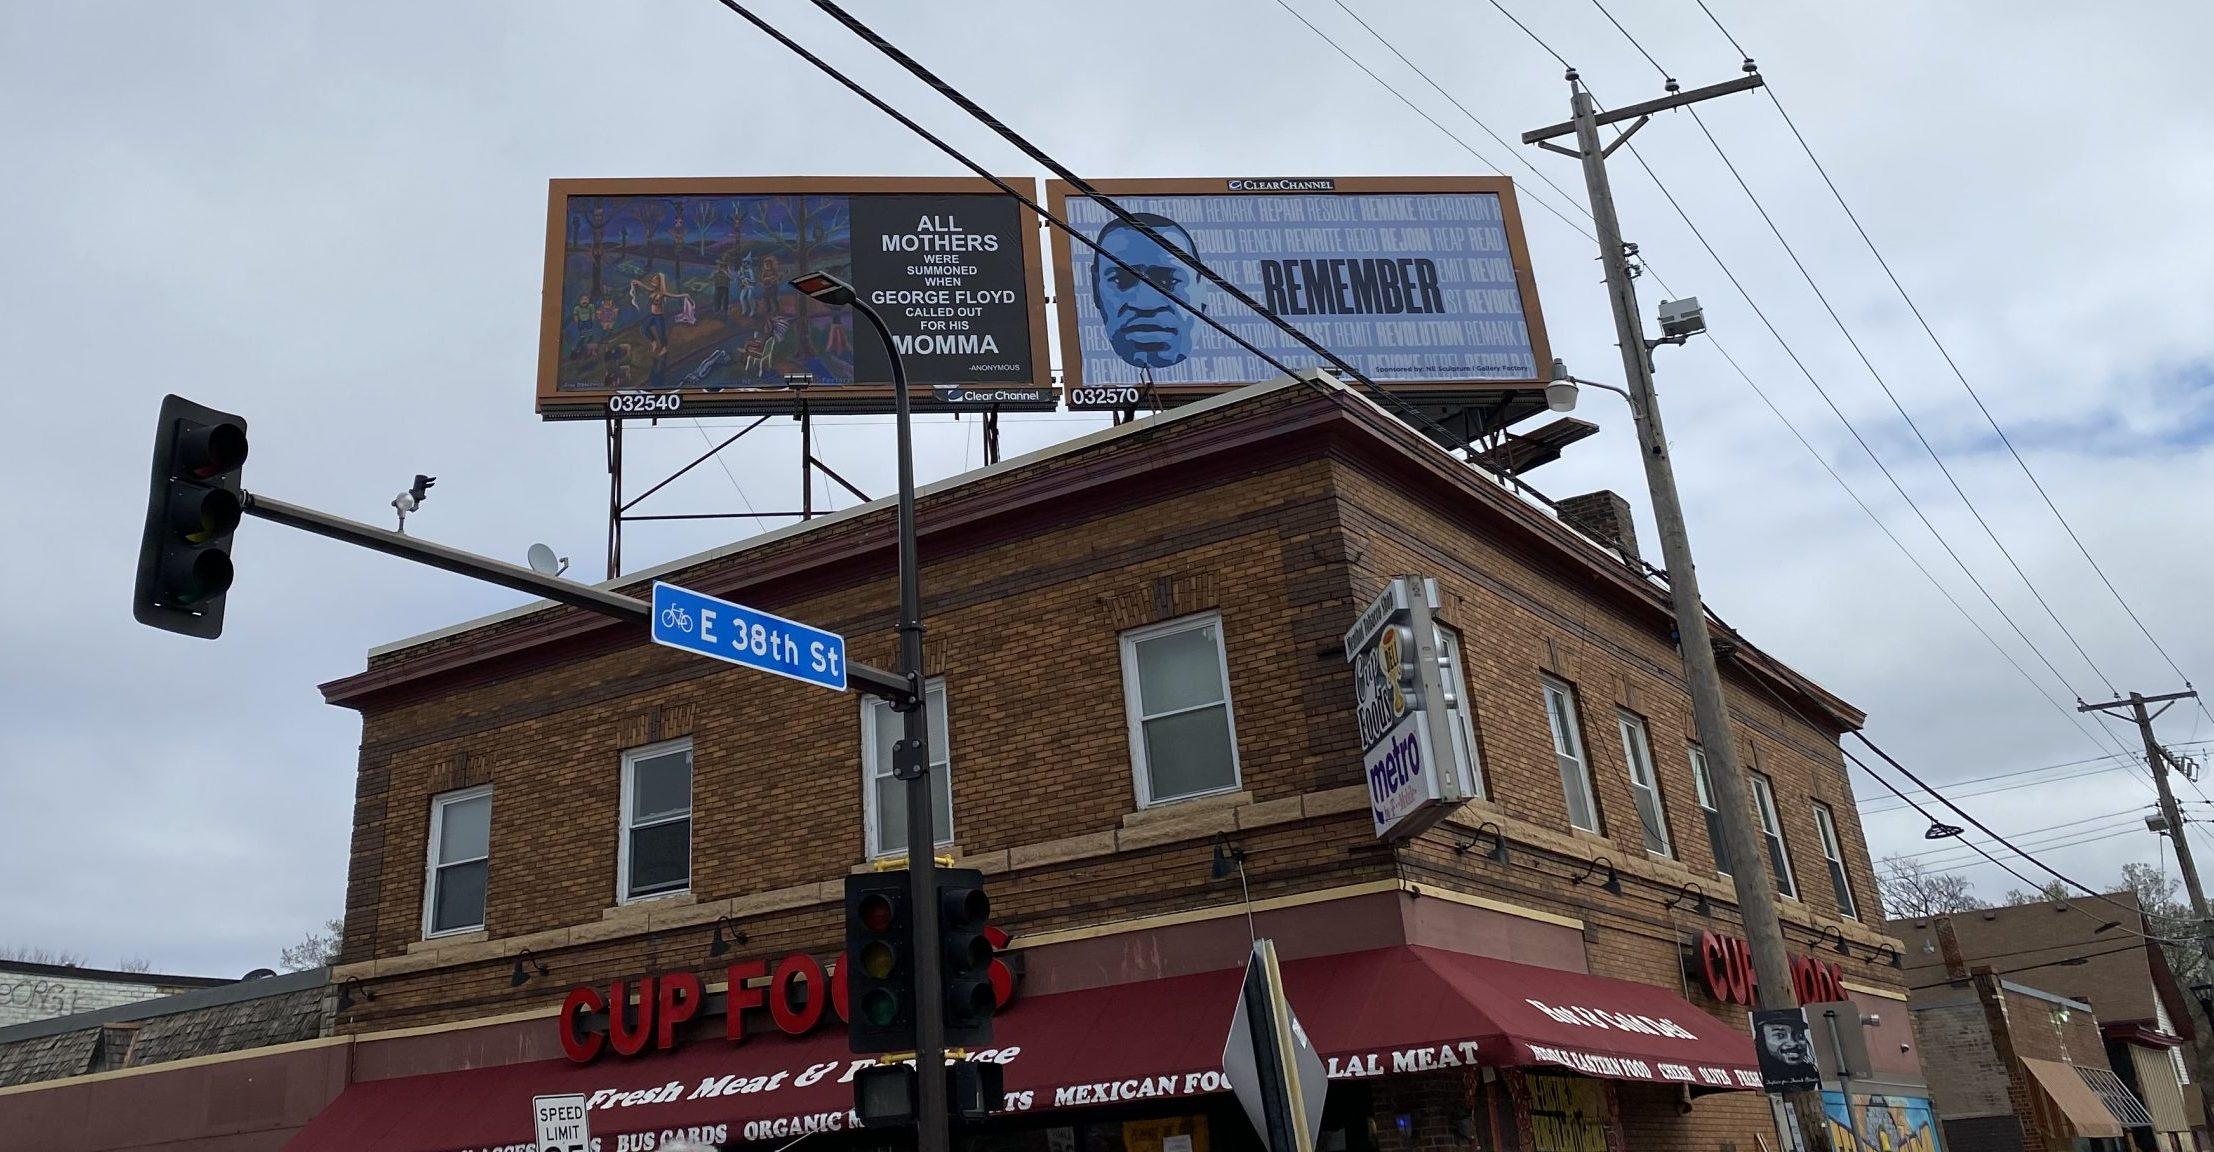 George Floyd Square billboards